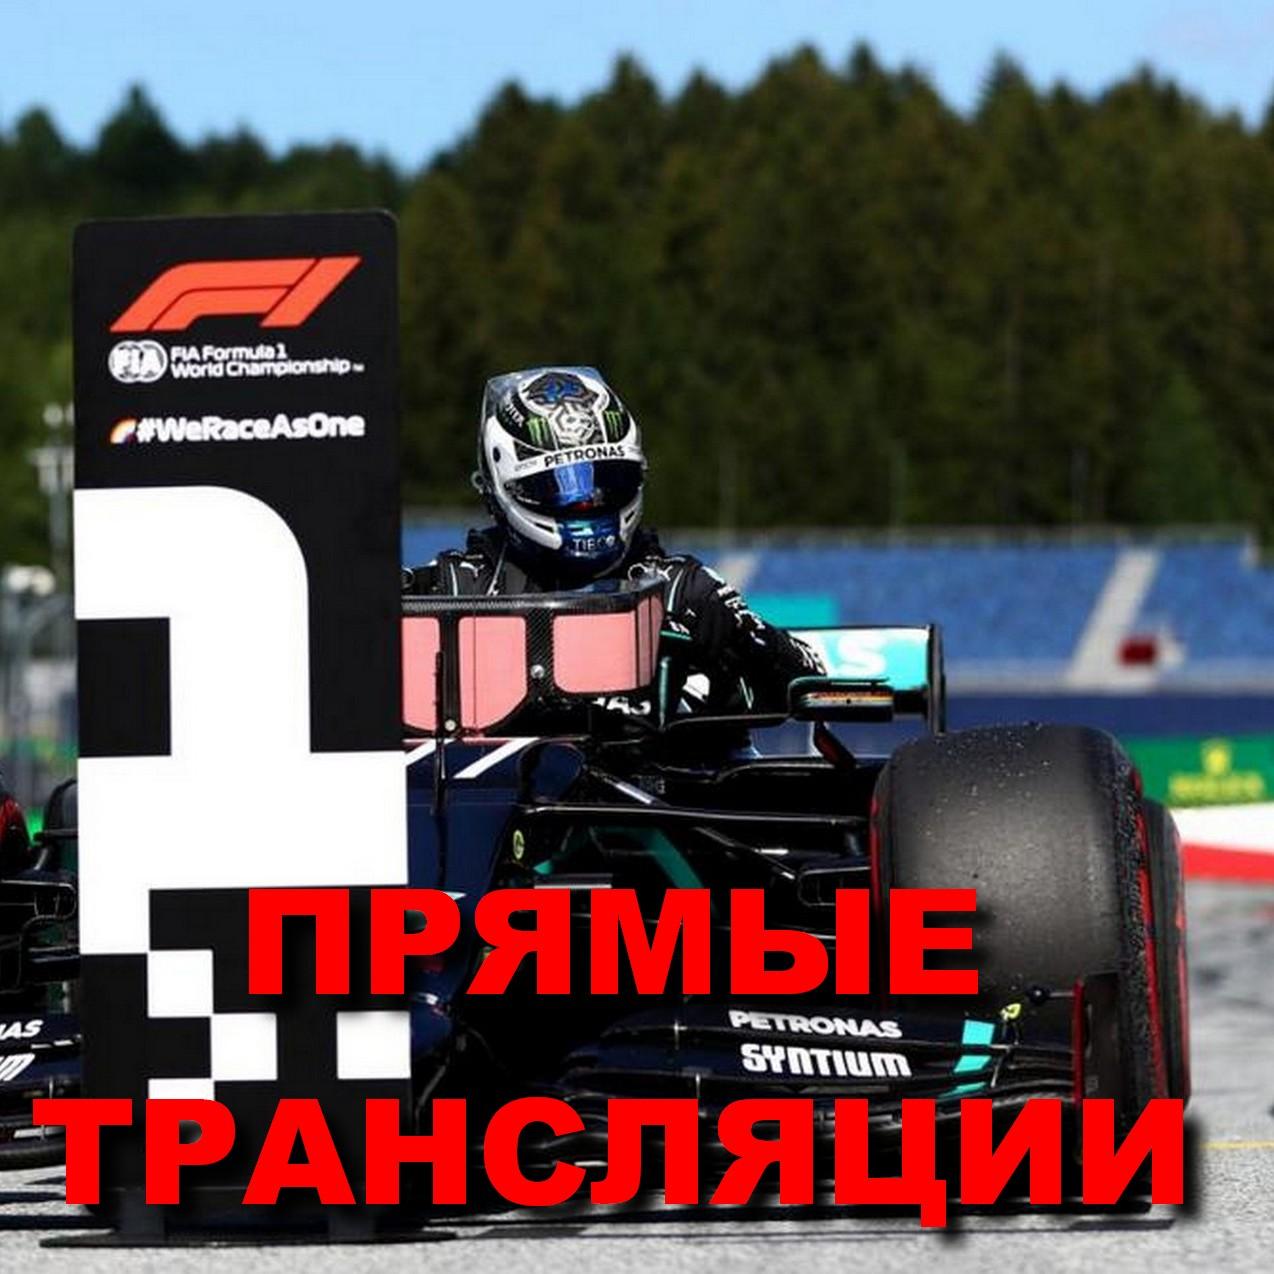 формула 1 прямая трансляция сегодня_crossbar_minsk